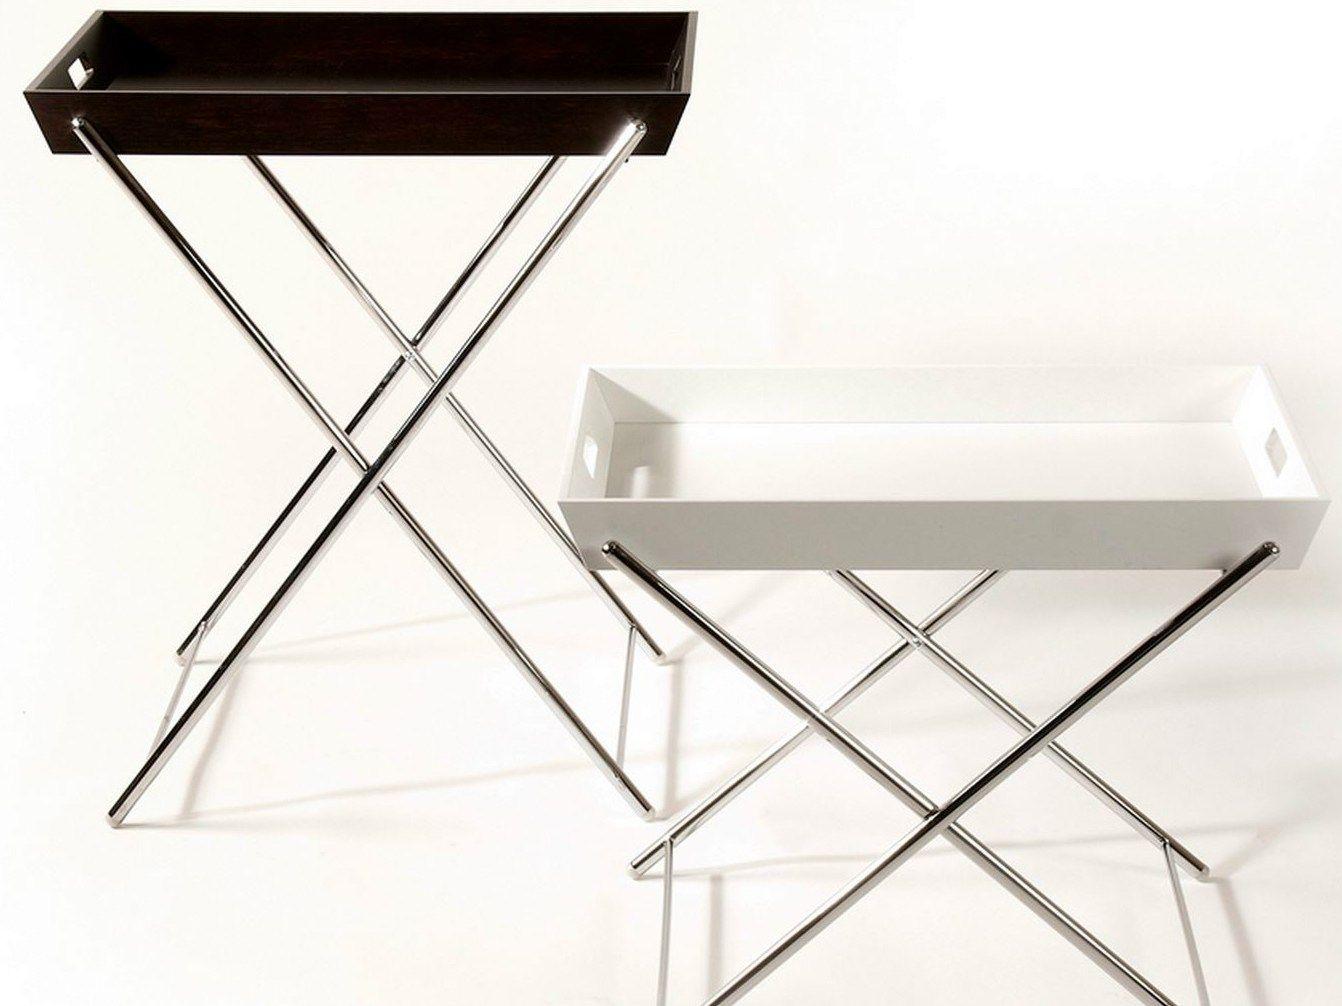 Tavolino vassoio miami by adentro design marco zanuso for Tavolino vassoio